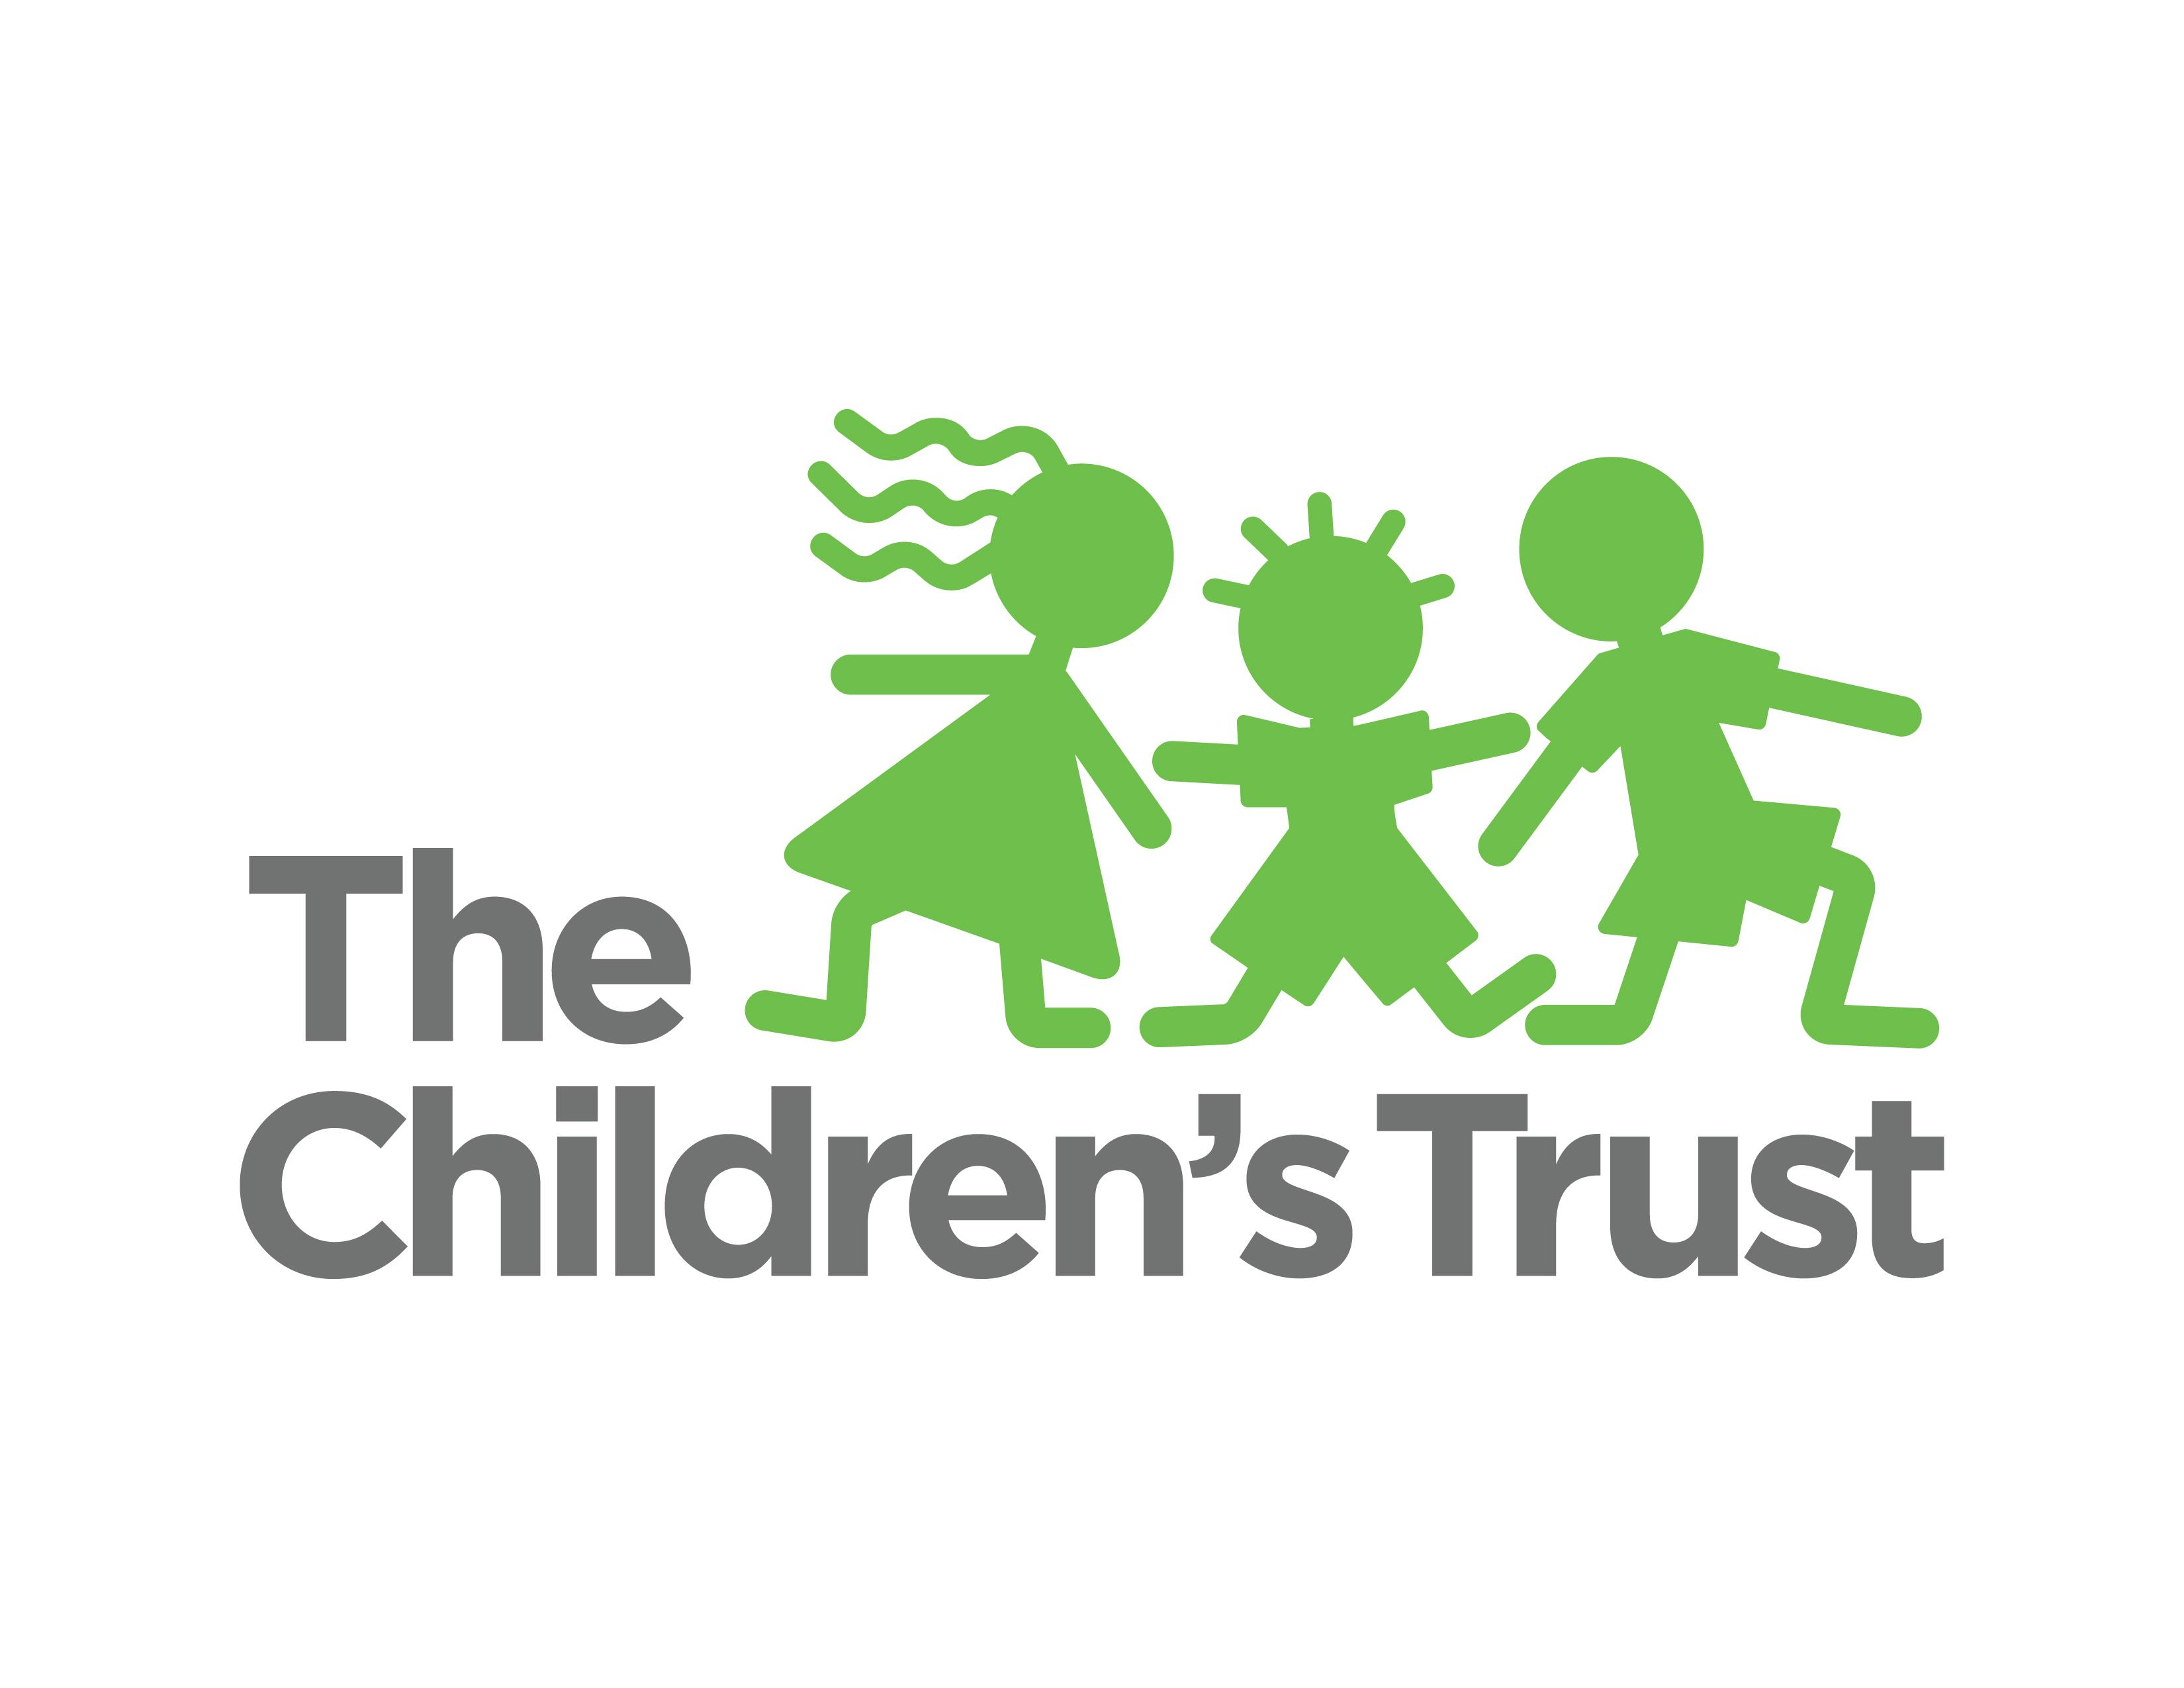 the_childrens_trust_logo_color-rgb